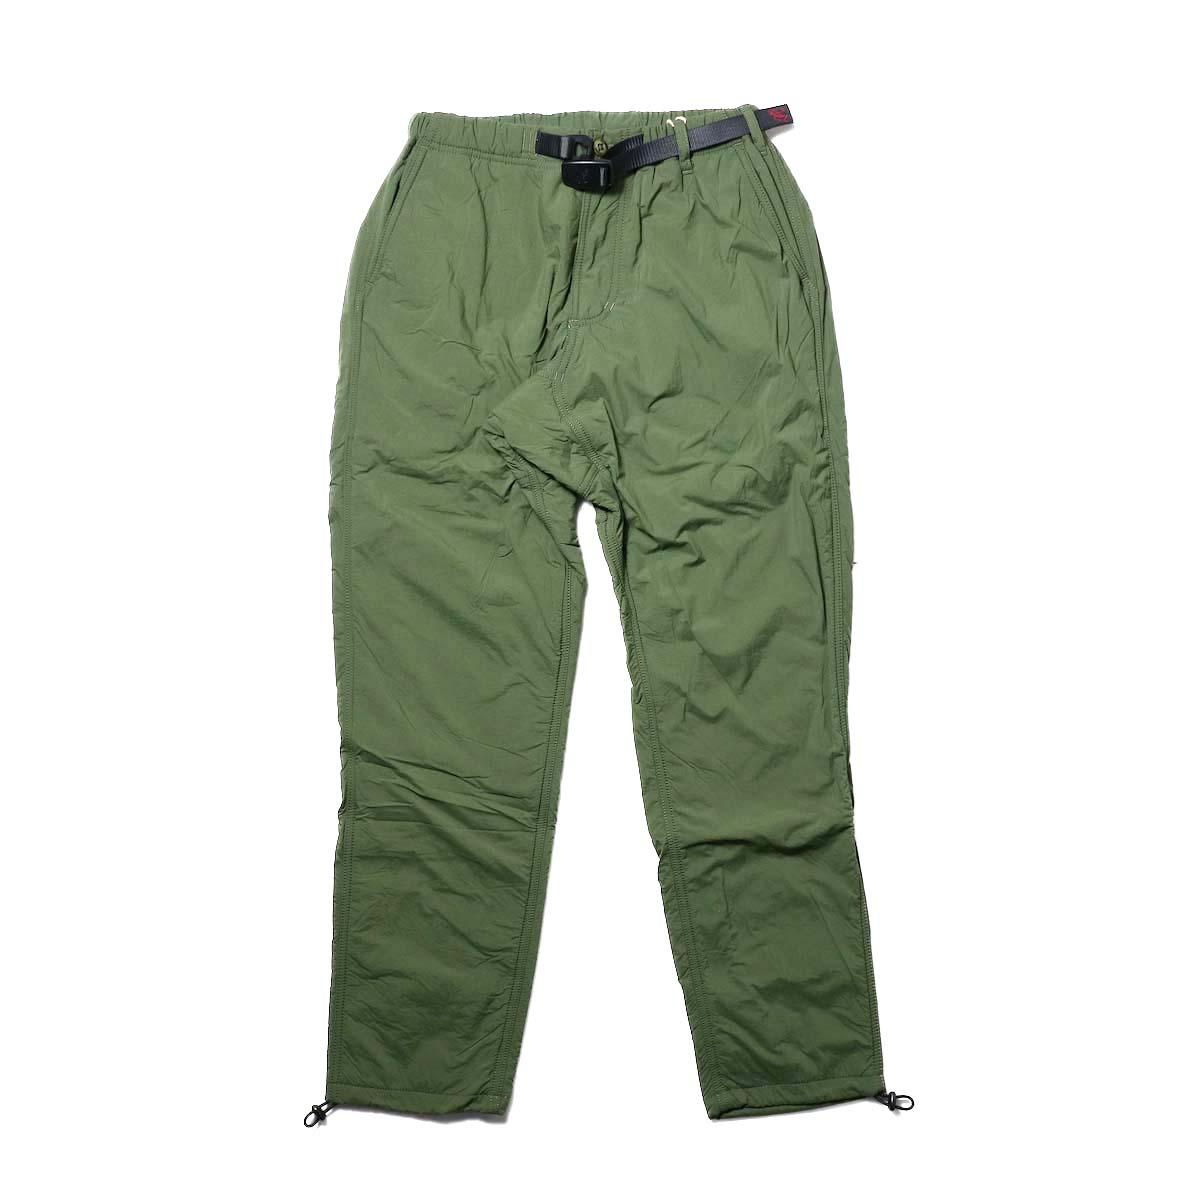 GRAMICCI / NYLON-FLEECE TRUCK PANTS (Olive)